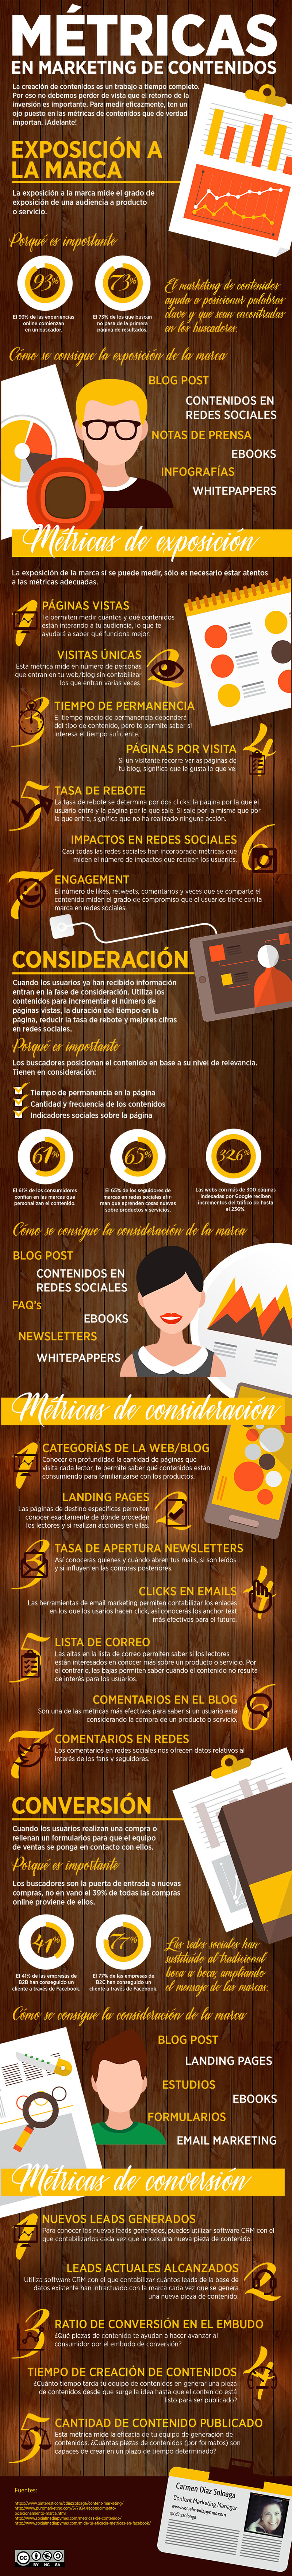 metricas-marketing-de-contenidos